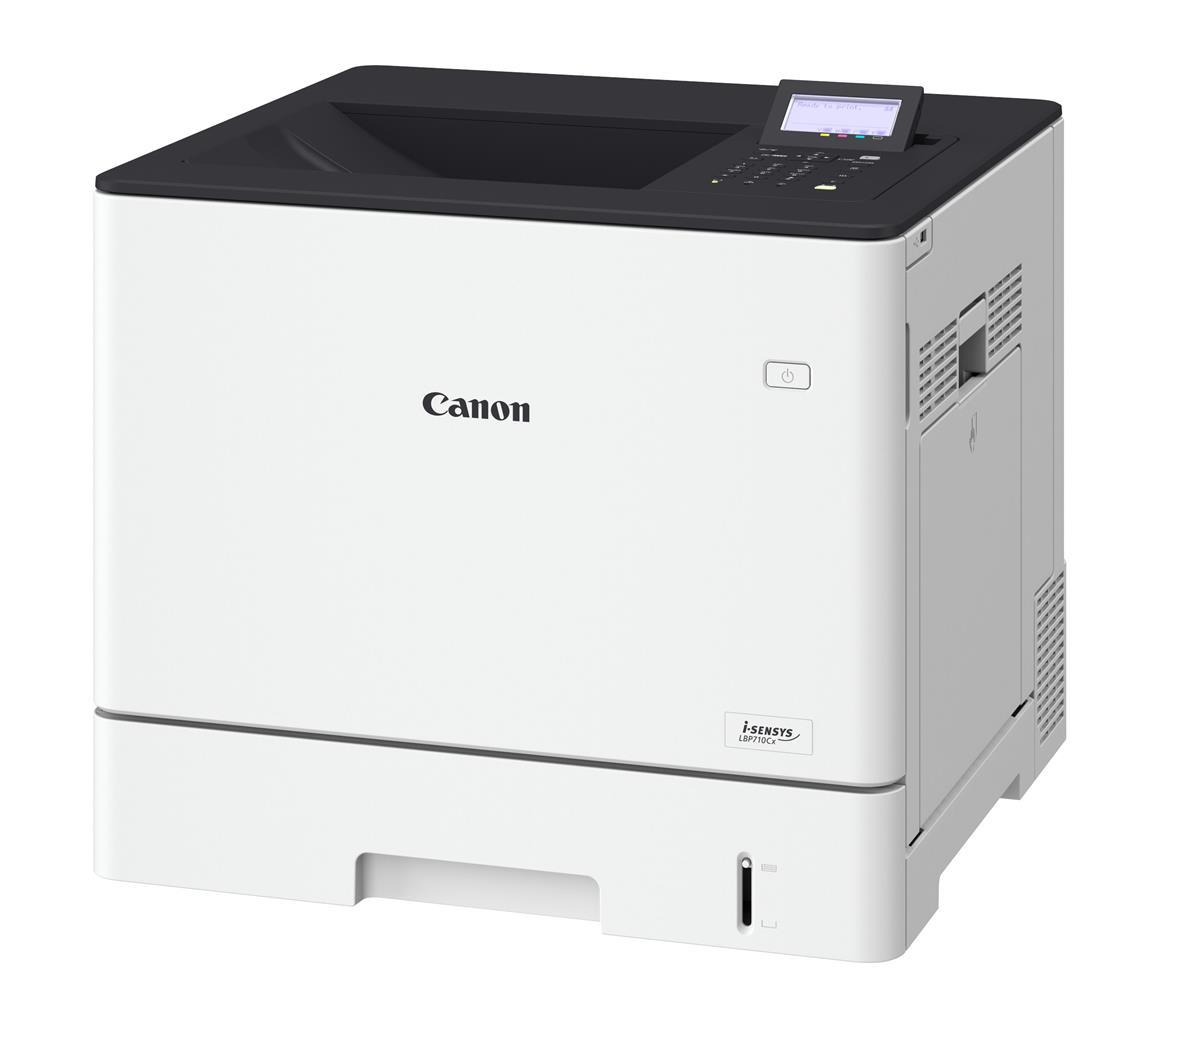 Canon I-SENSYS LBP710Cx Colour Laser Printer 33ppm White Ref 0656C009AA